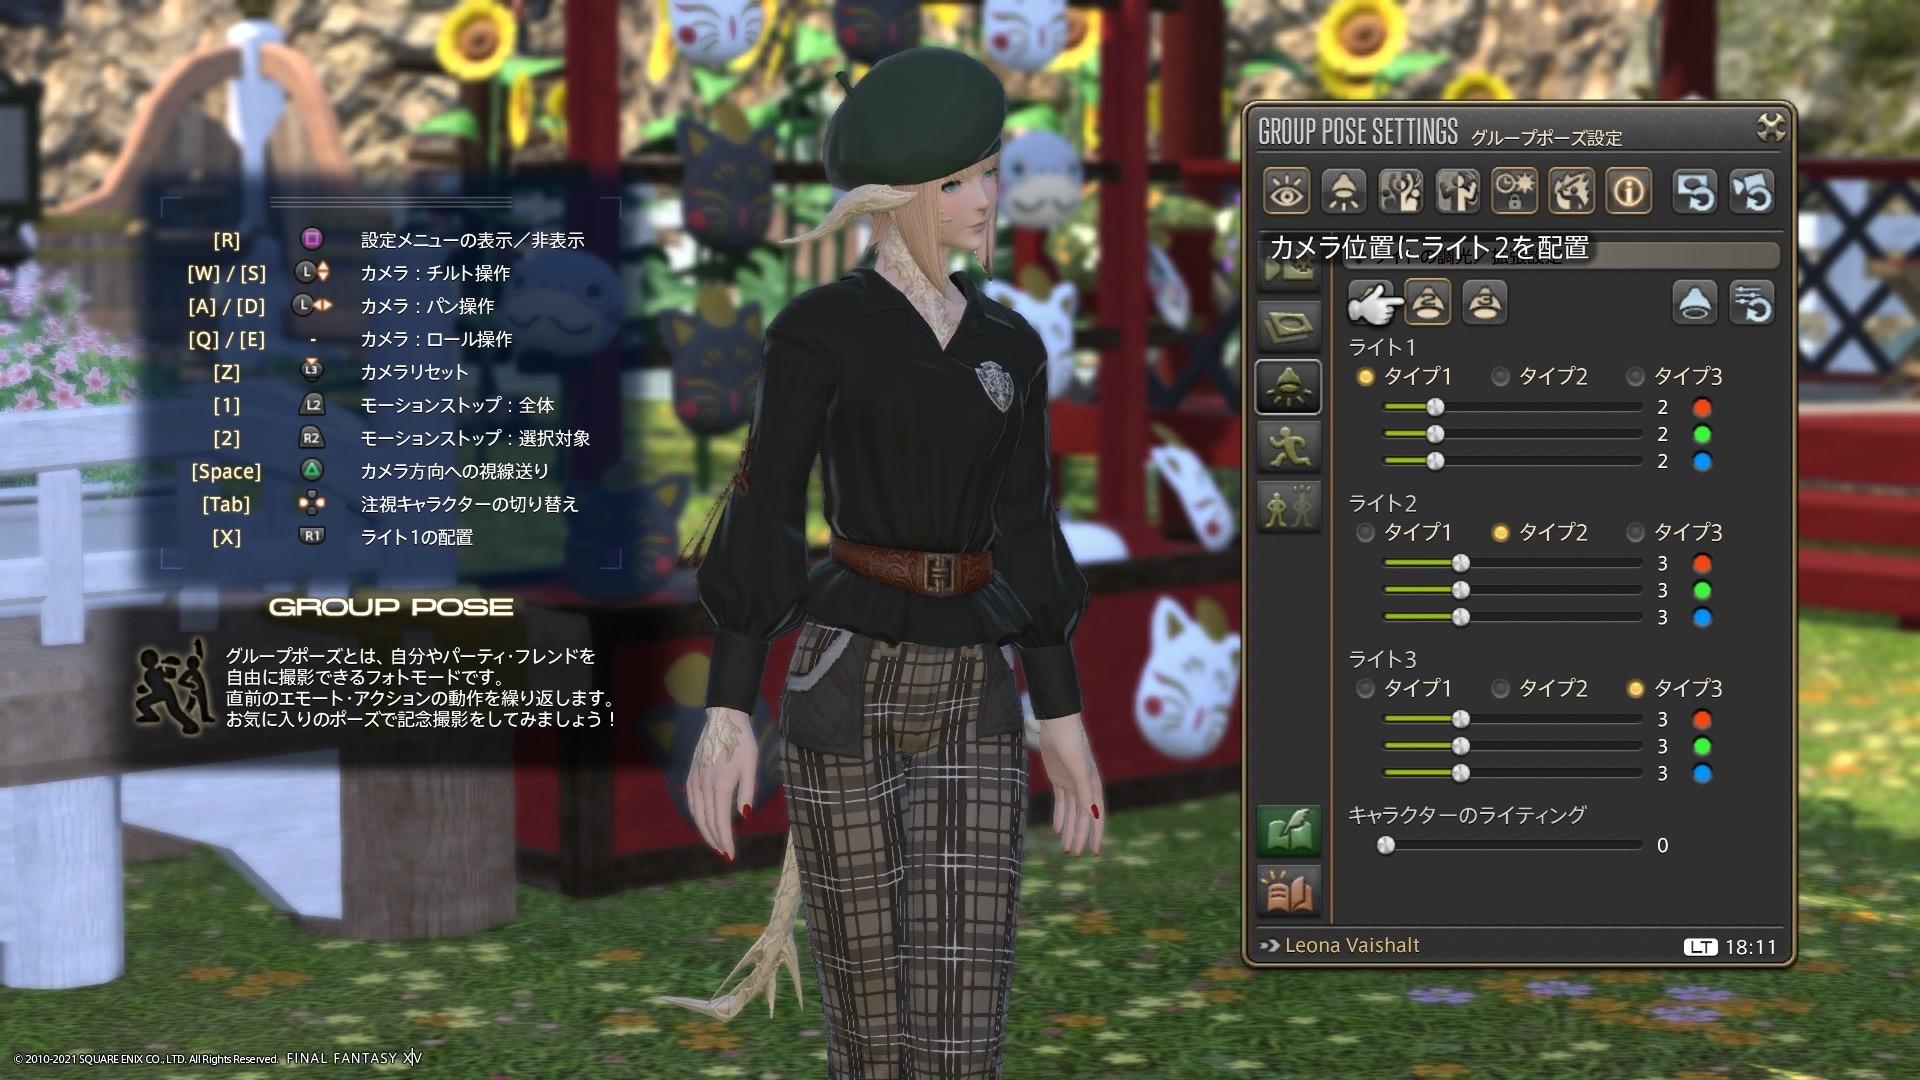 f:id:leonanoblog:20210912181417j:plain